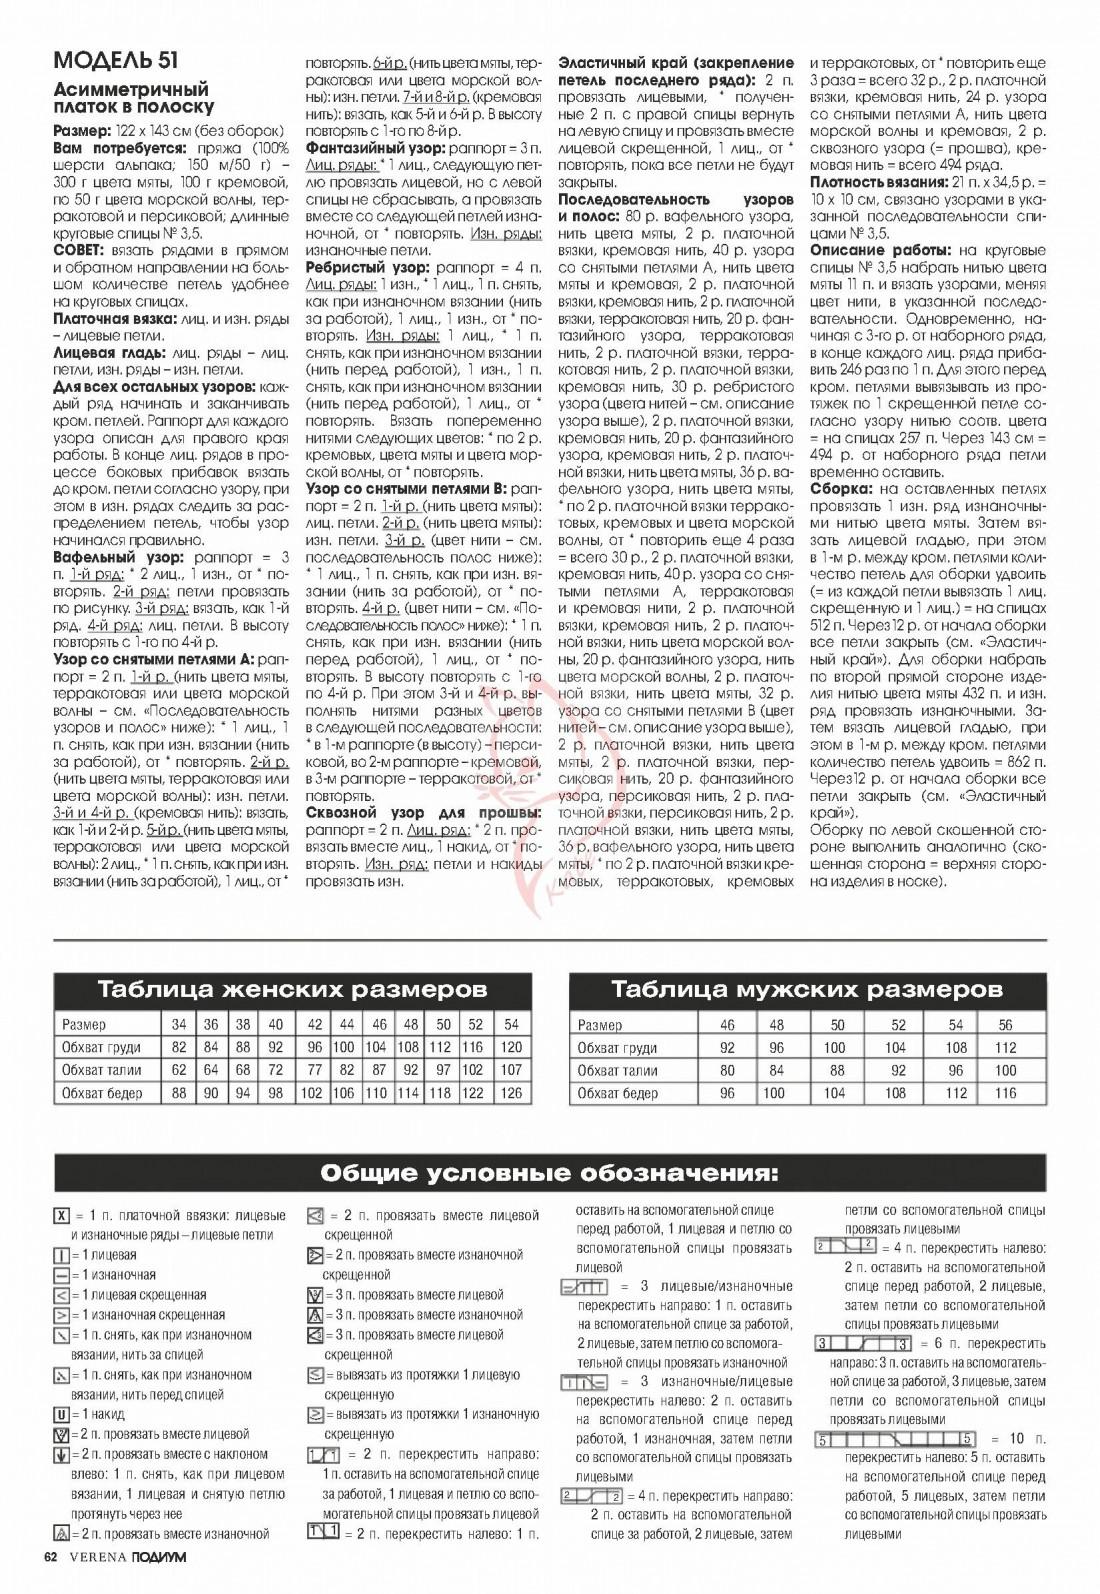 Page_0006220127b36fcc182c3.jpg